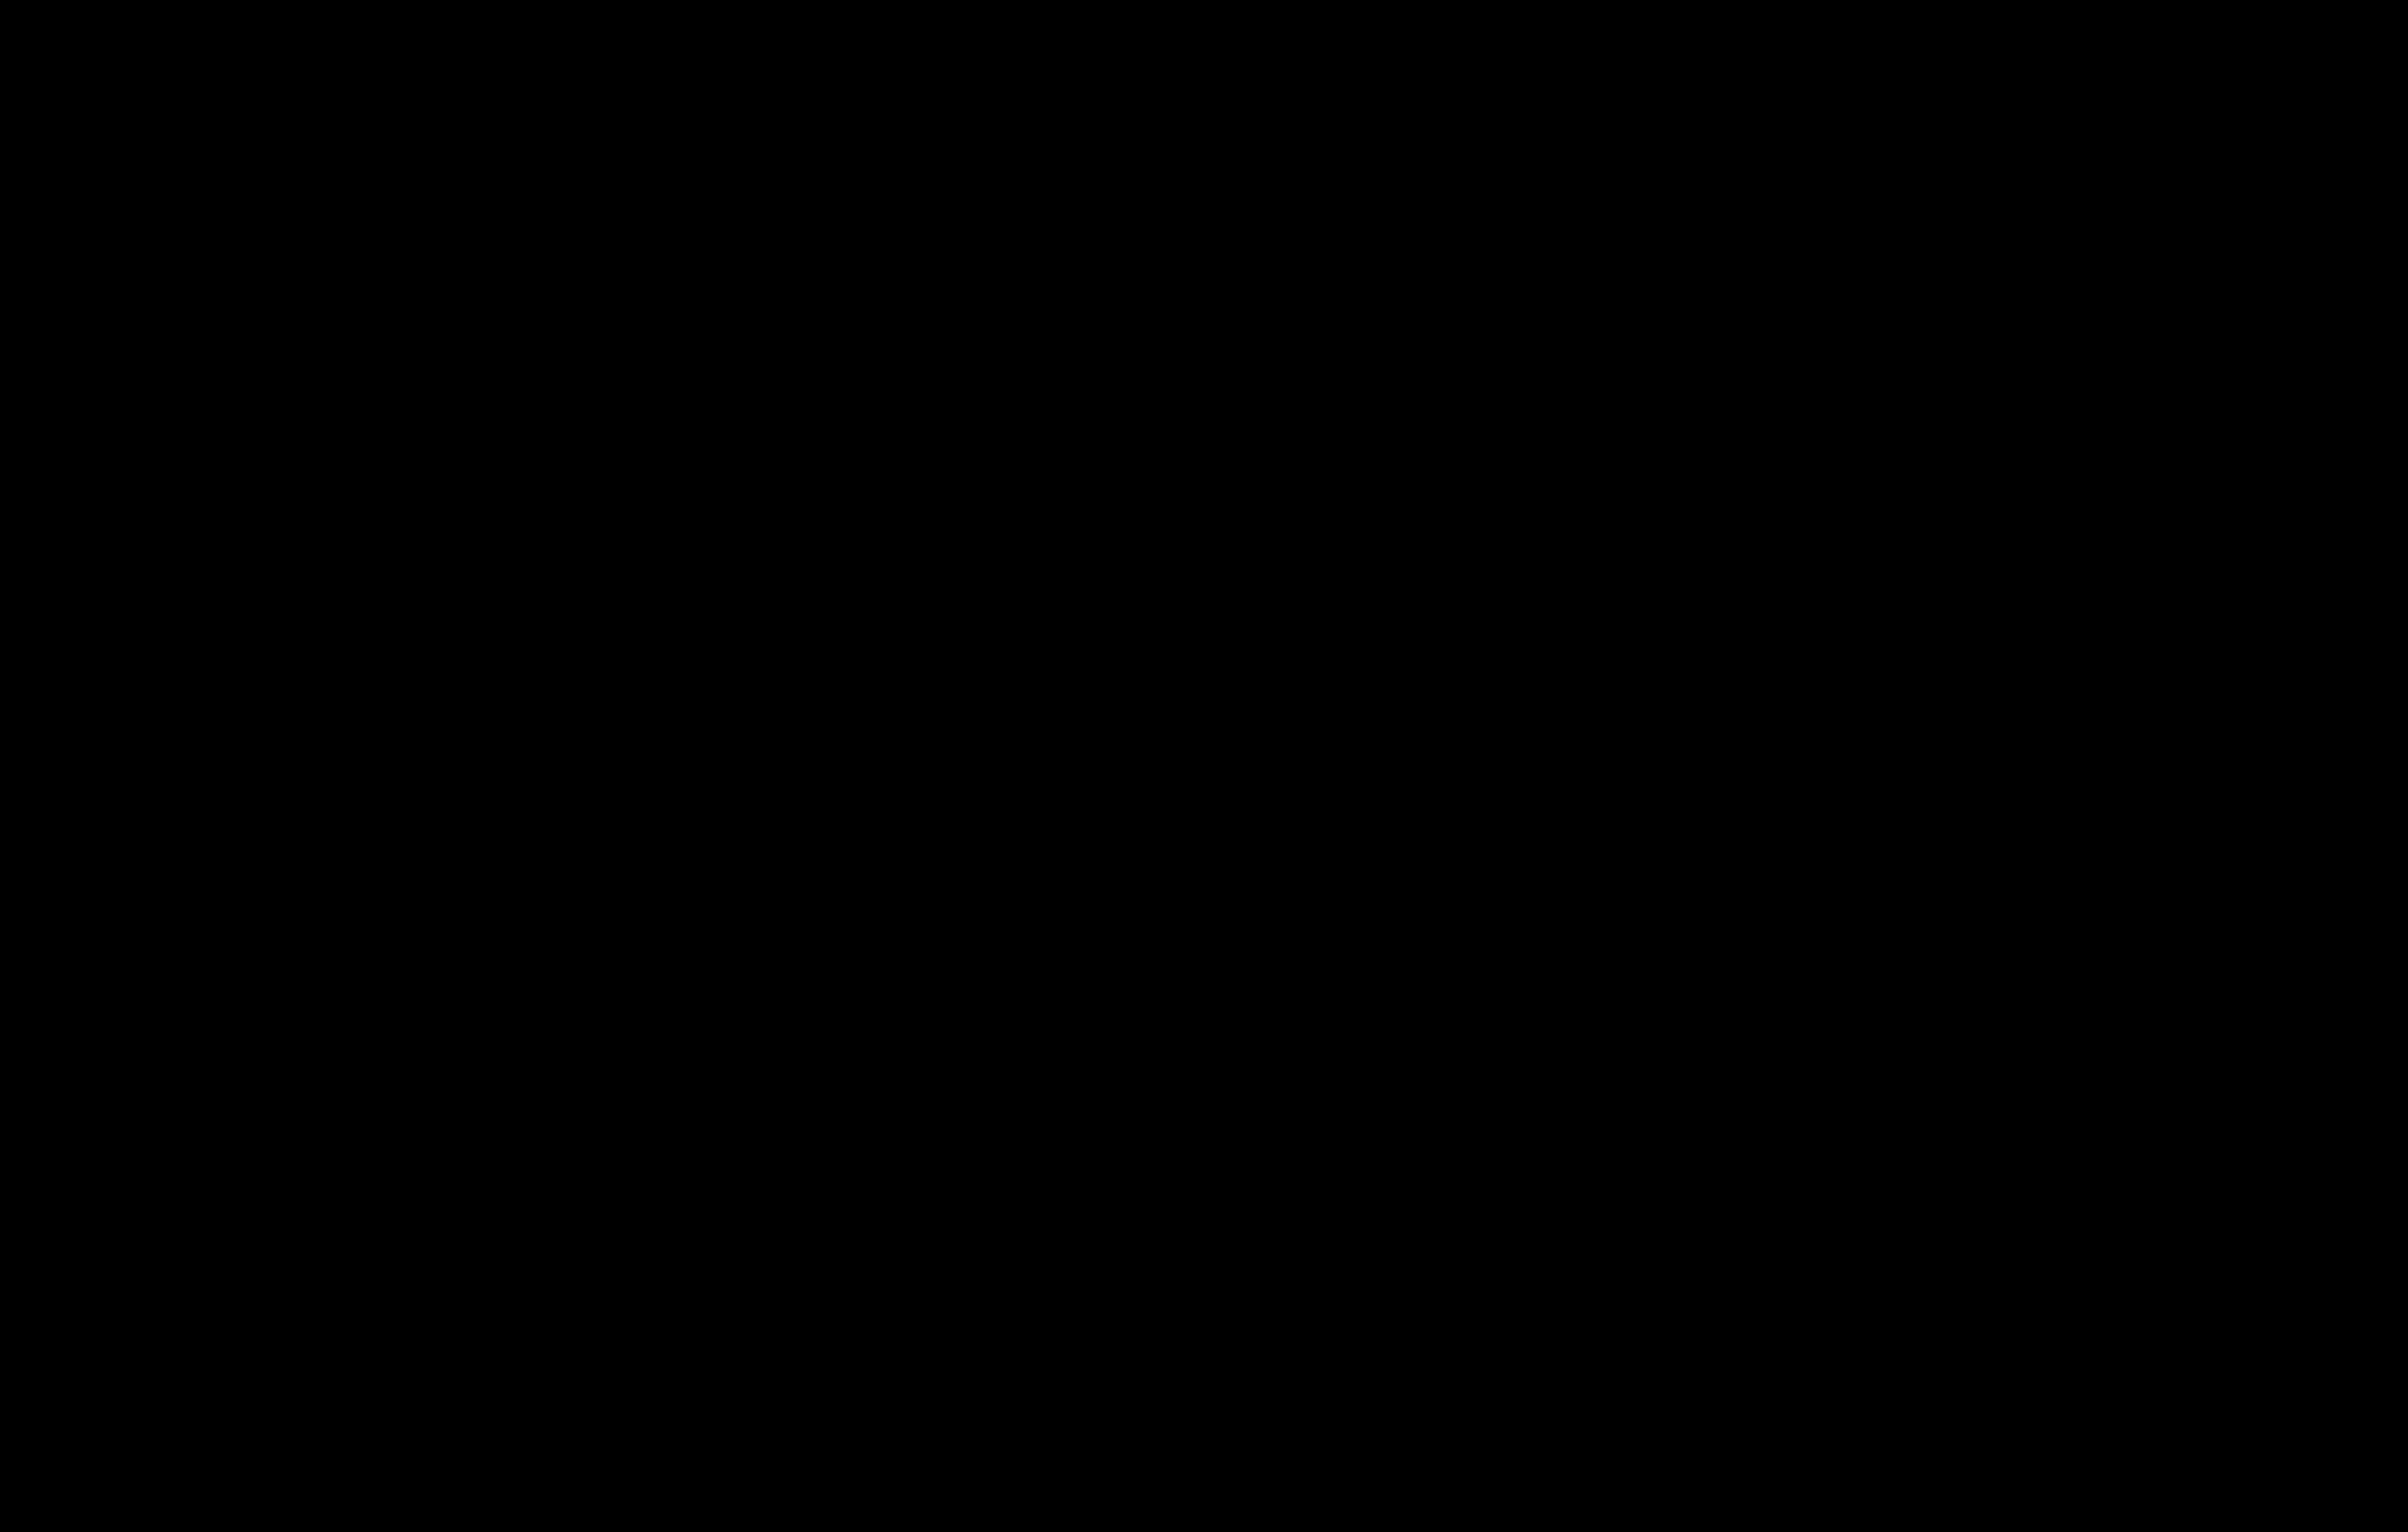 wellesley college  u2013 logos download